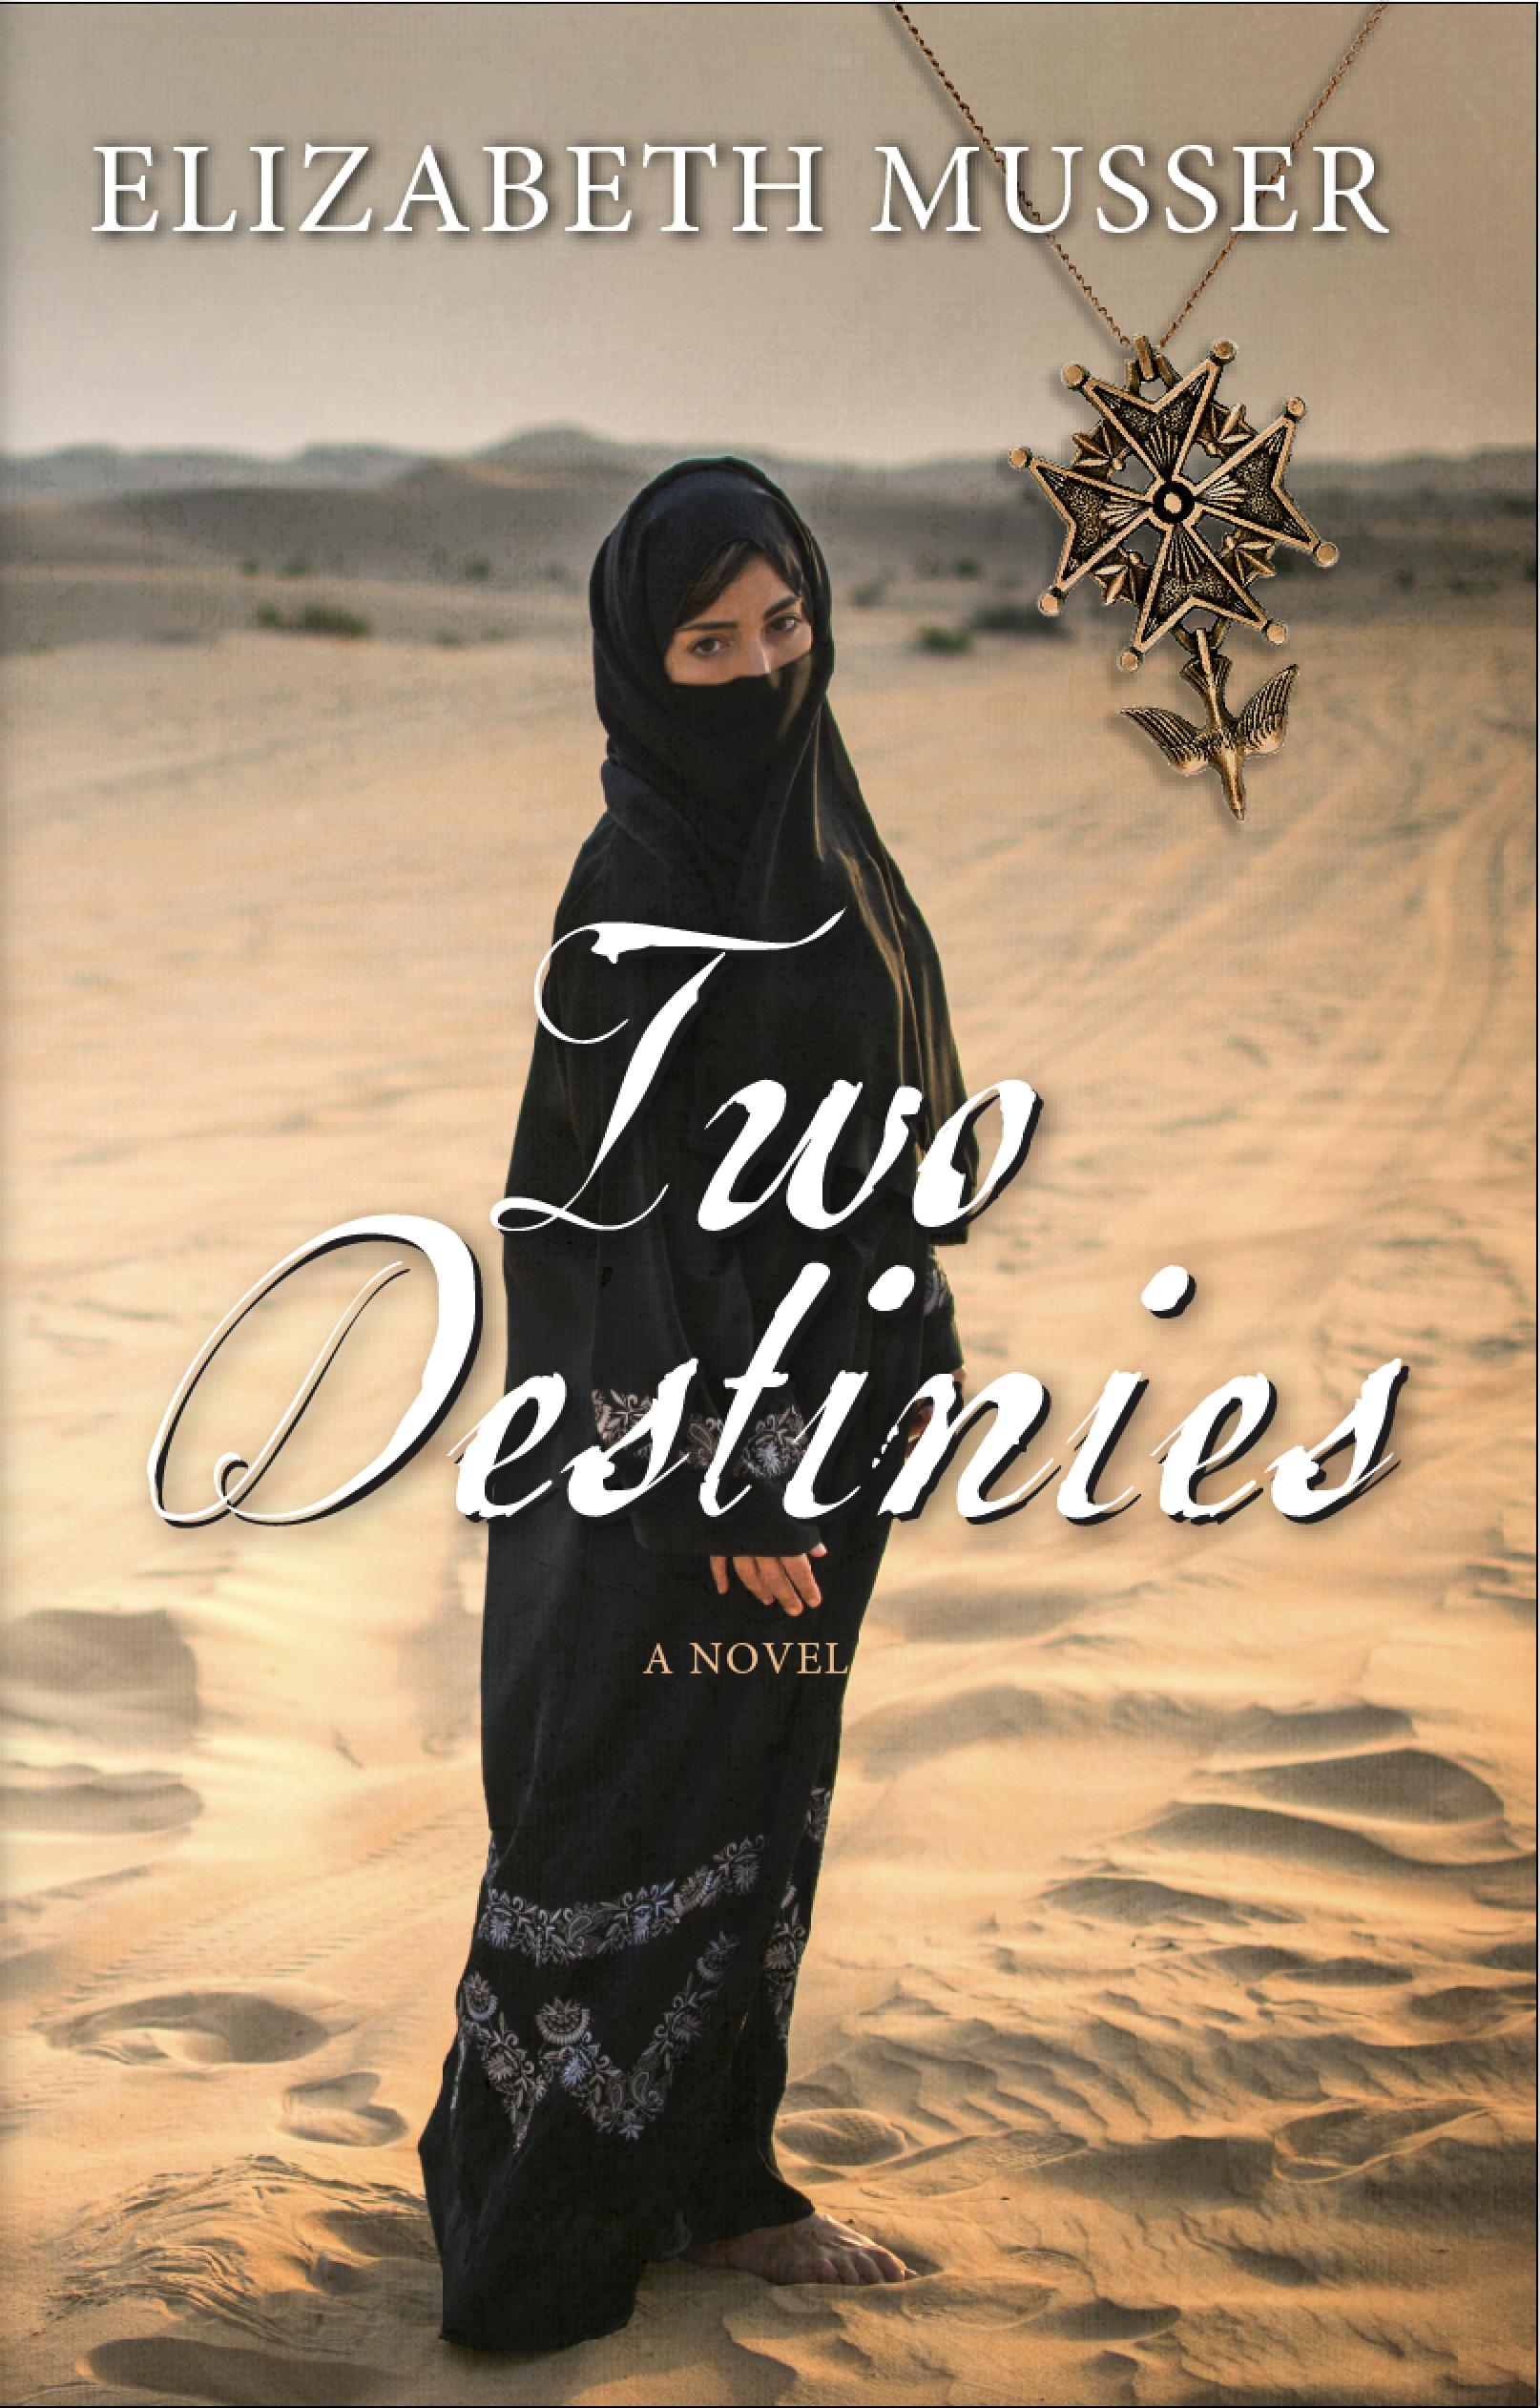 trilogy-two destinies-a novel-19-09